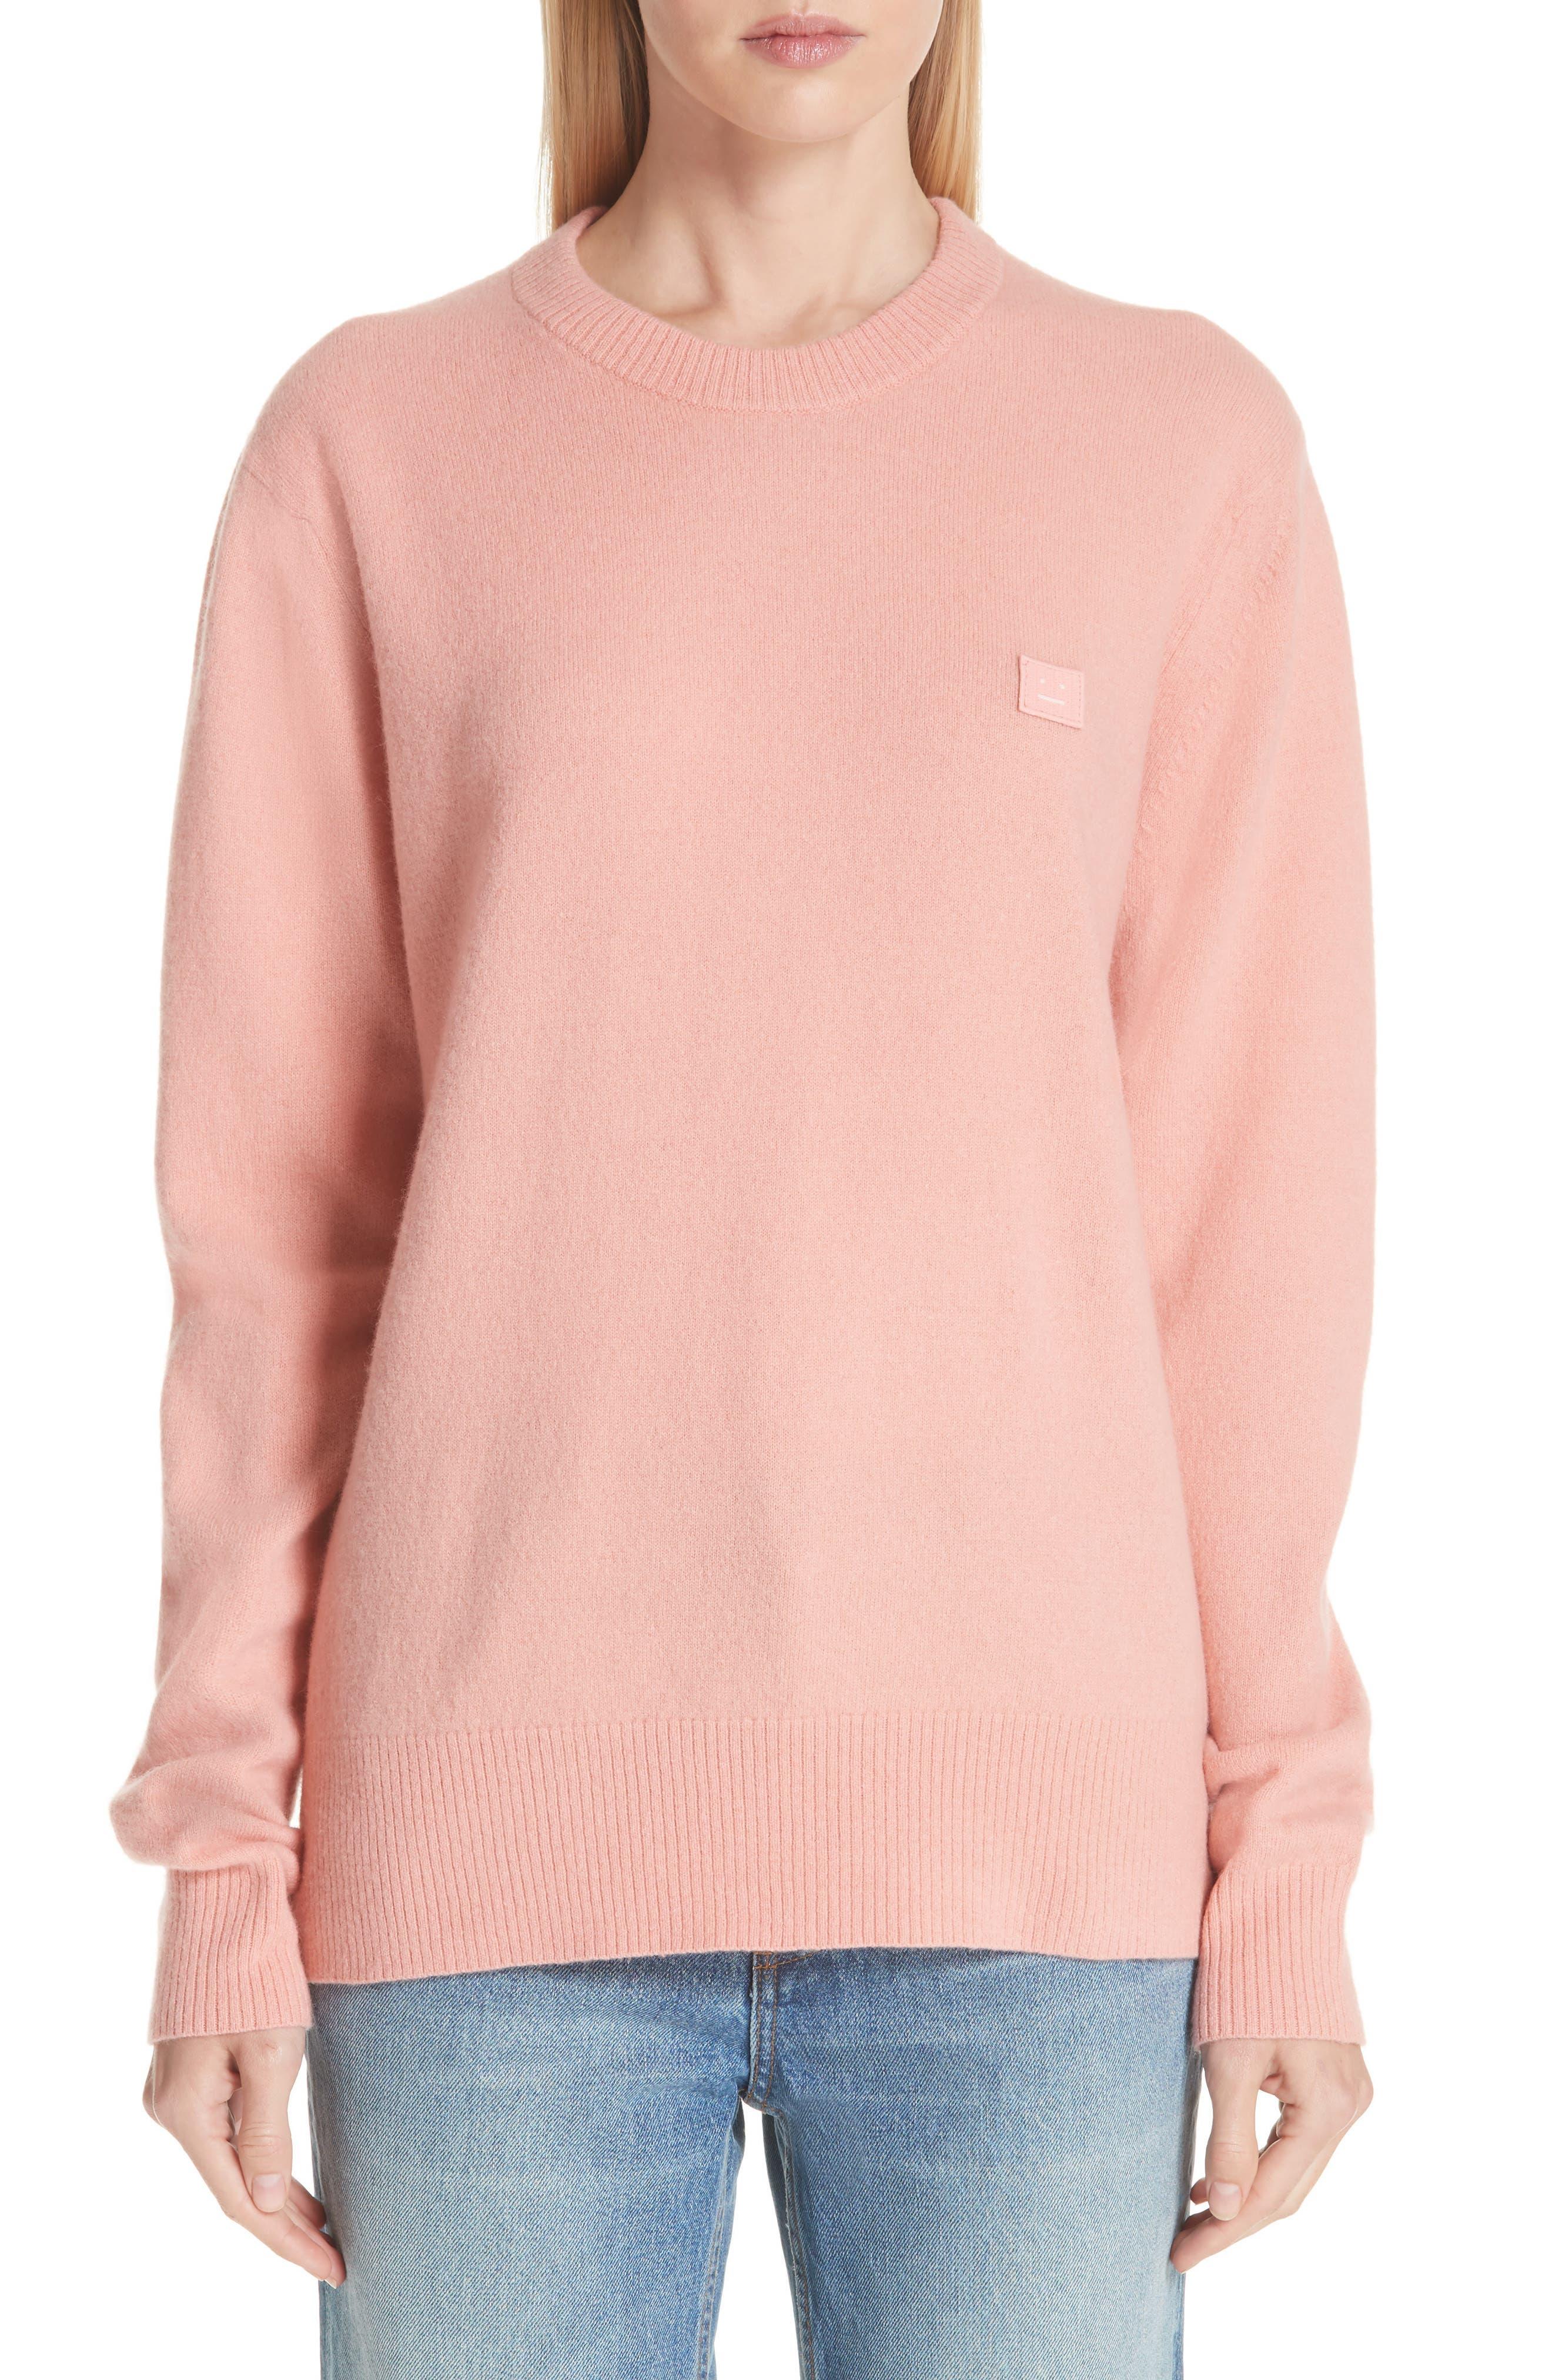 Acne Studios Nalon Wool Sweater, Pink